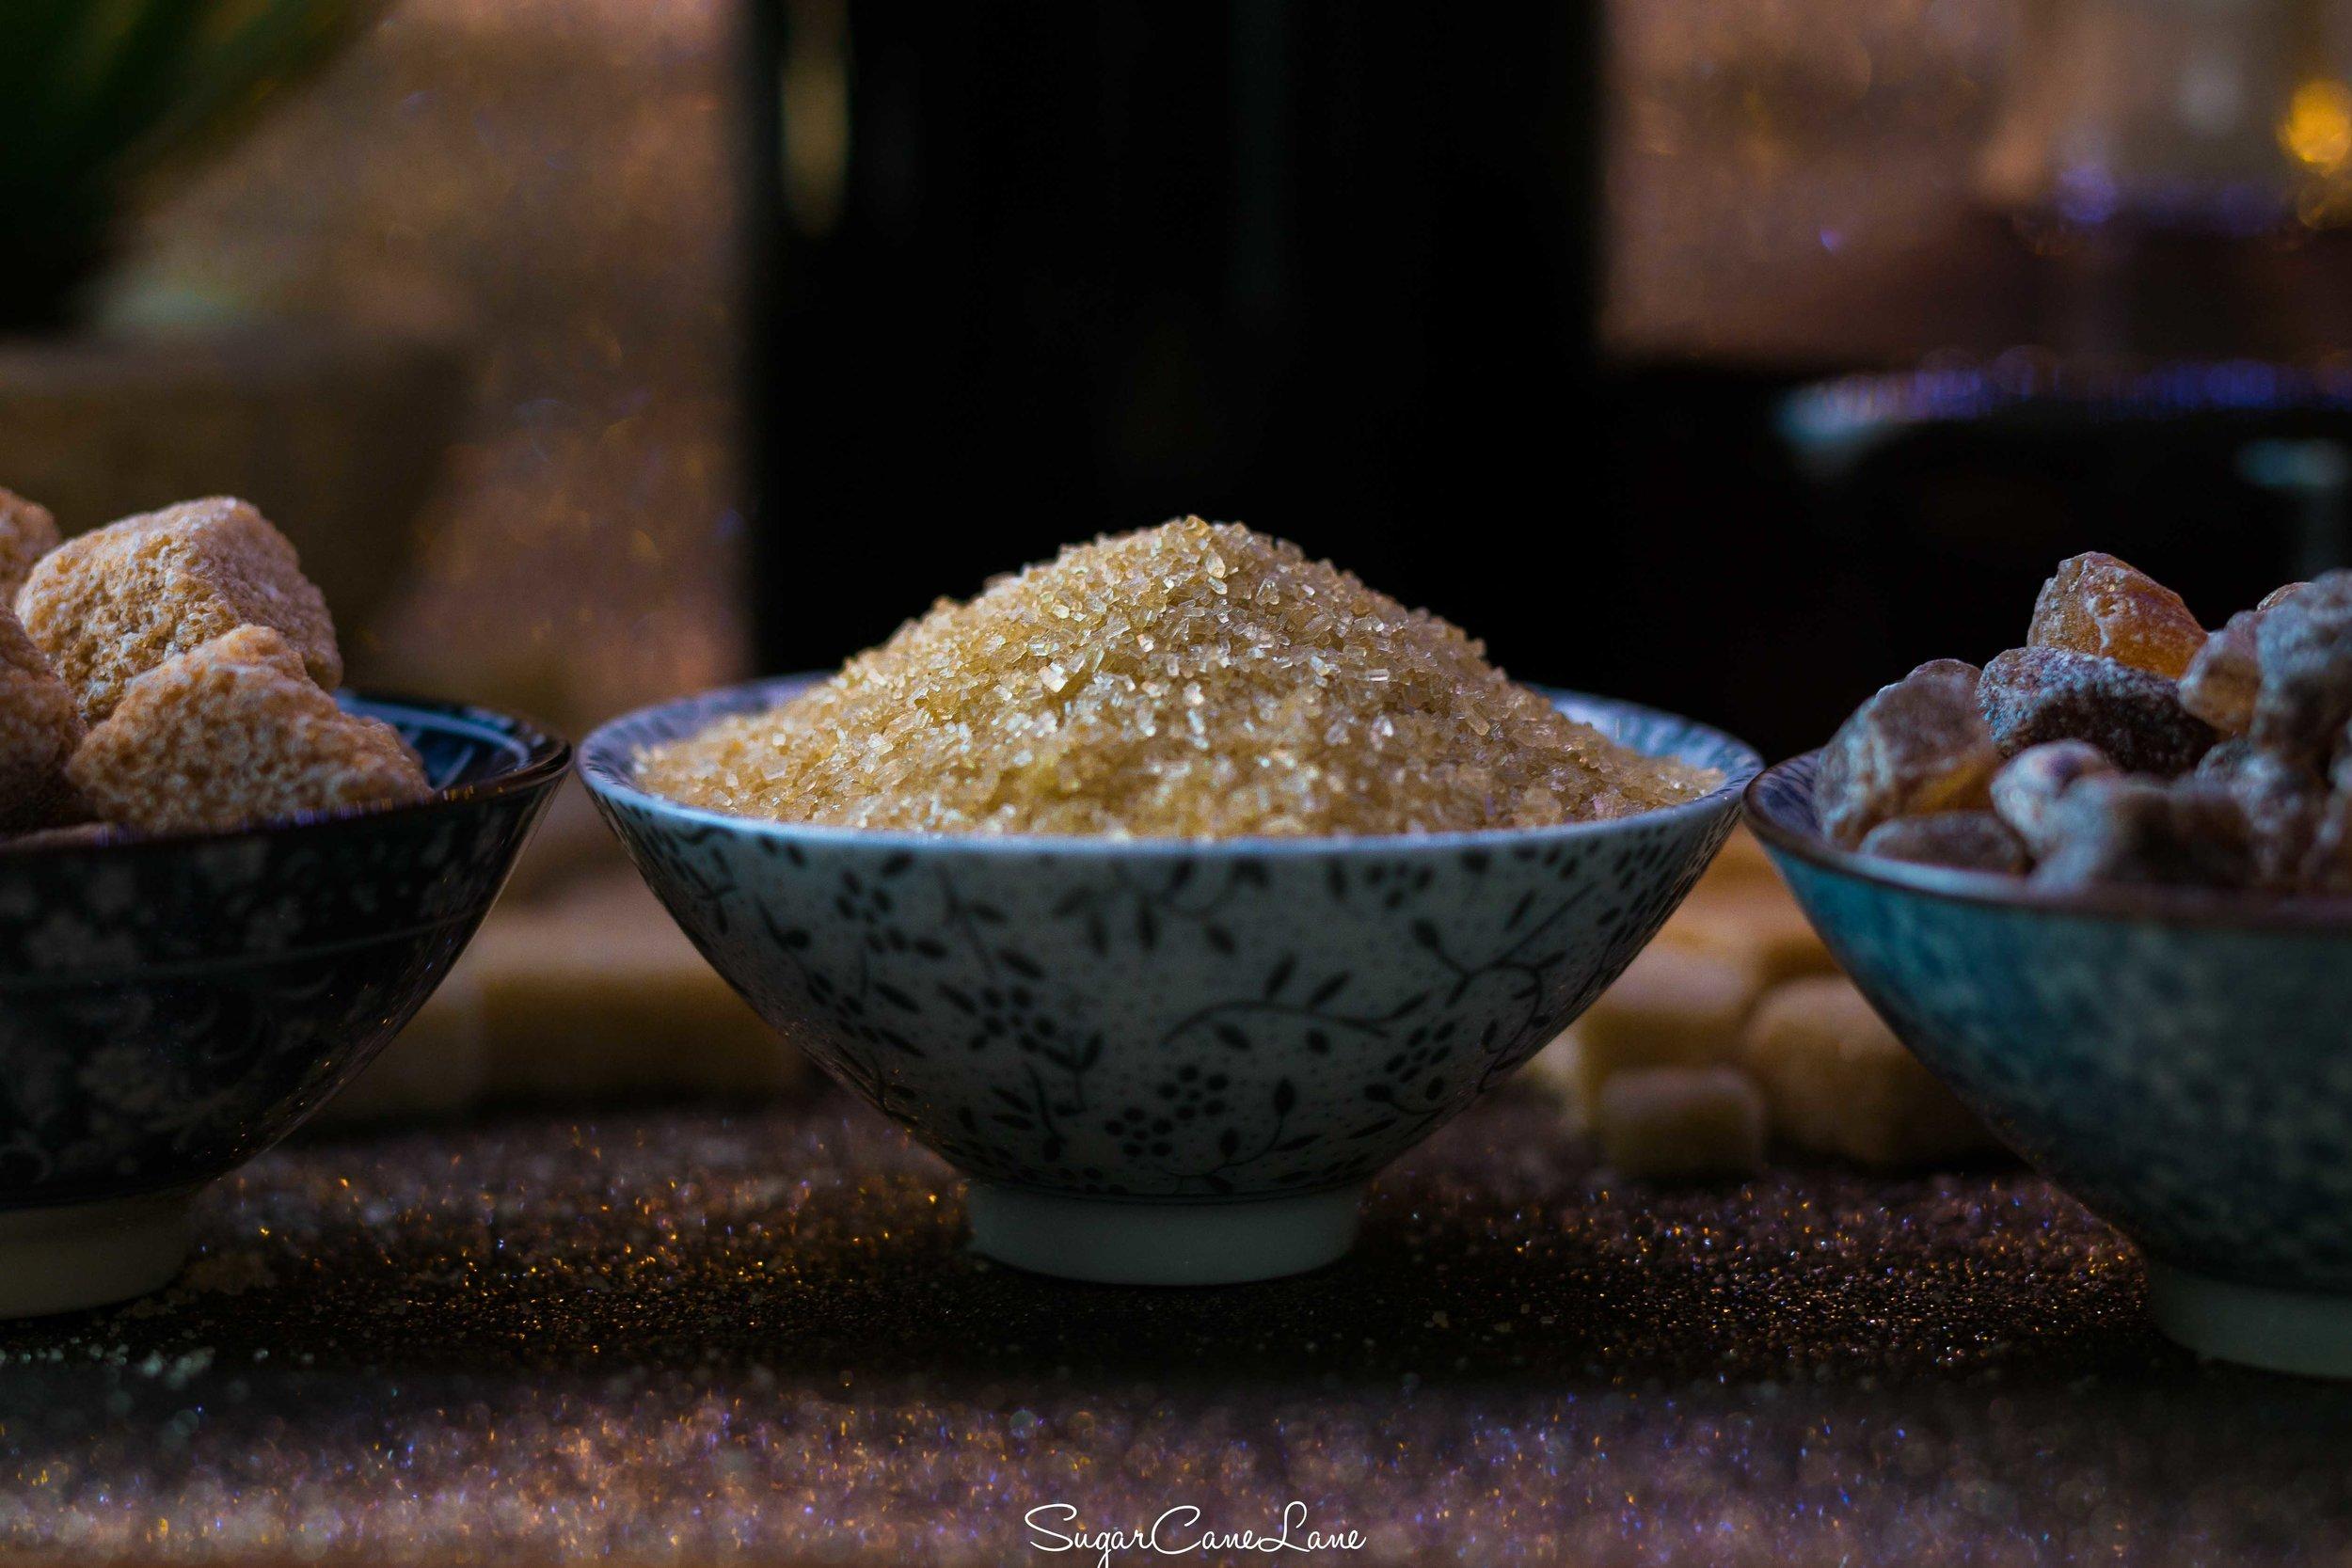 sugarcane_sugar_bowl_0530.jpg